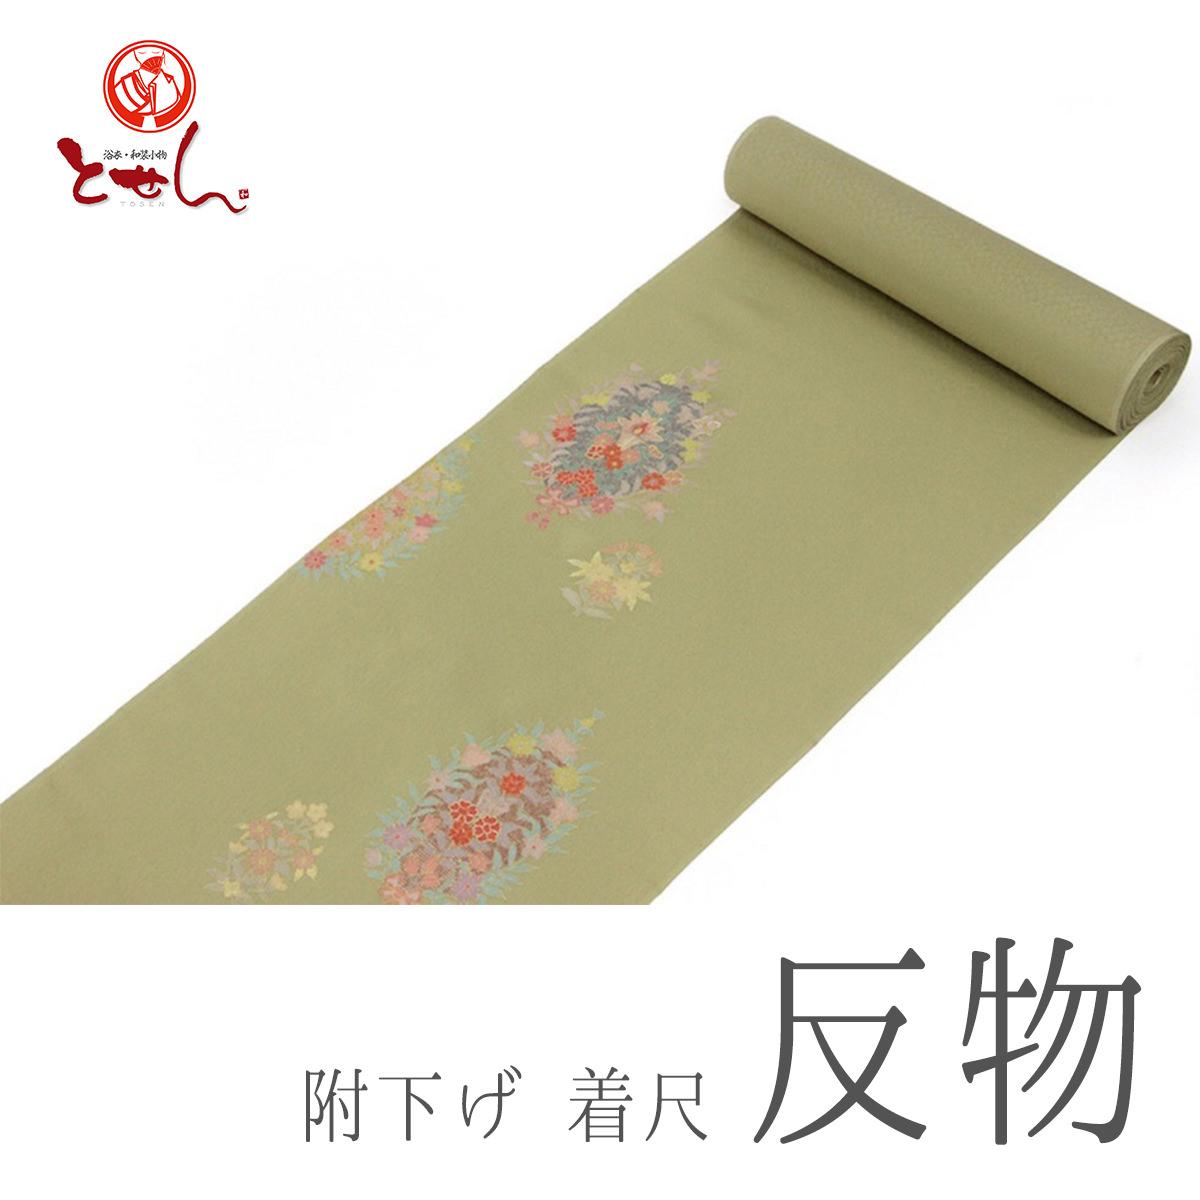 New Disney Bambi Umbrella Parasol Embroidered Short Slide White from Japan